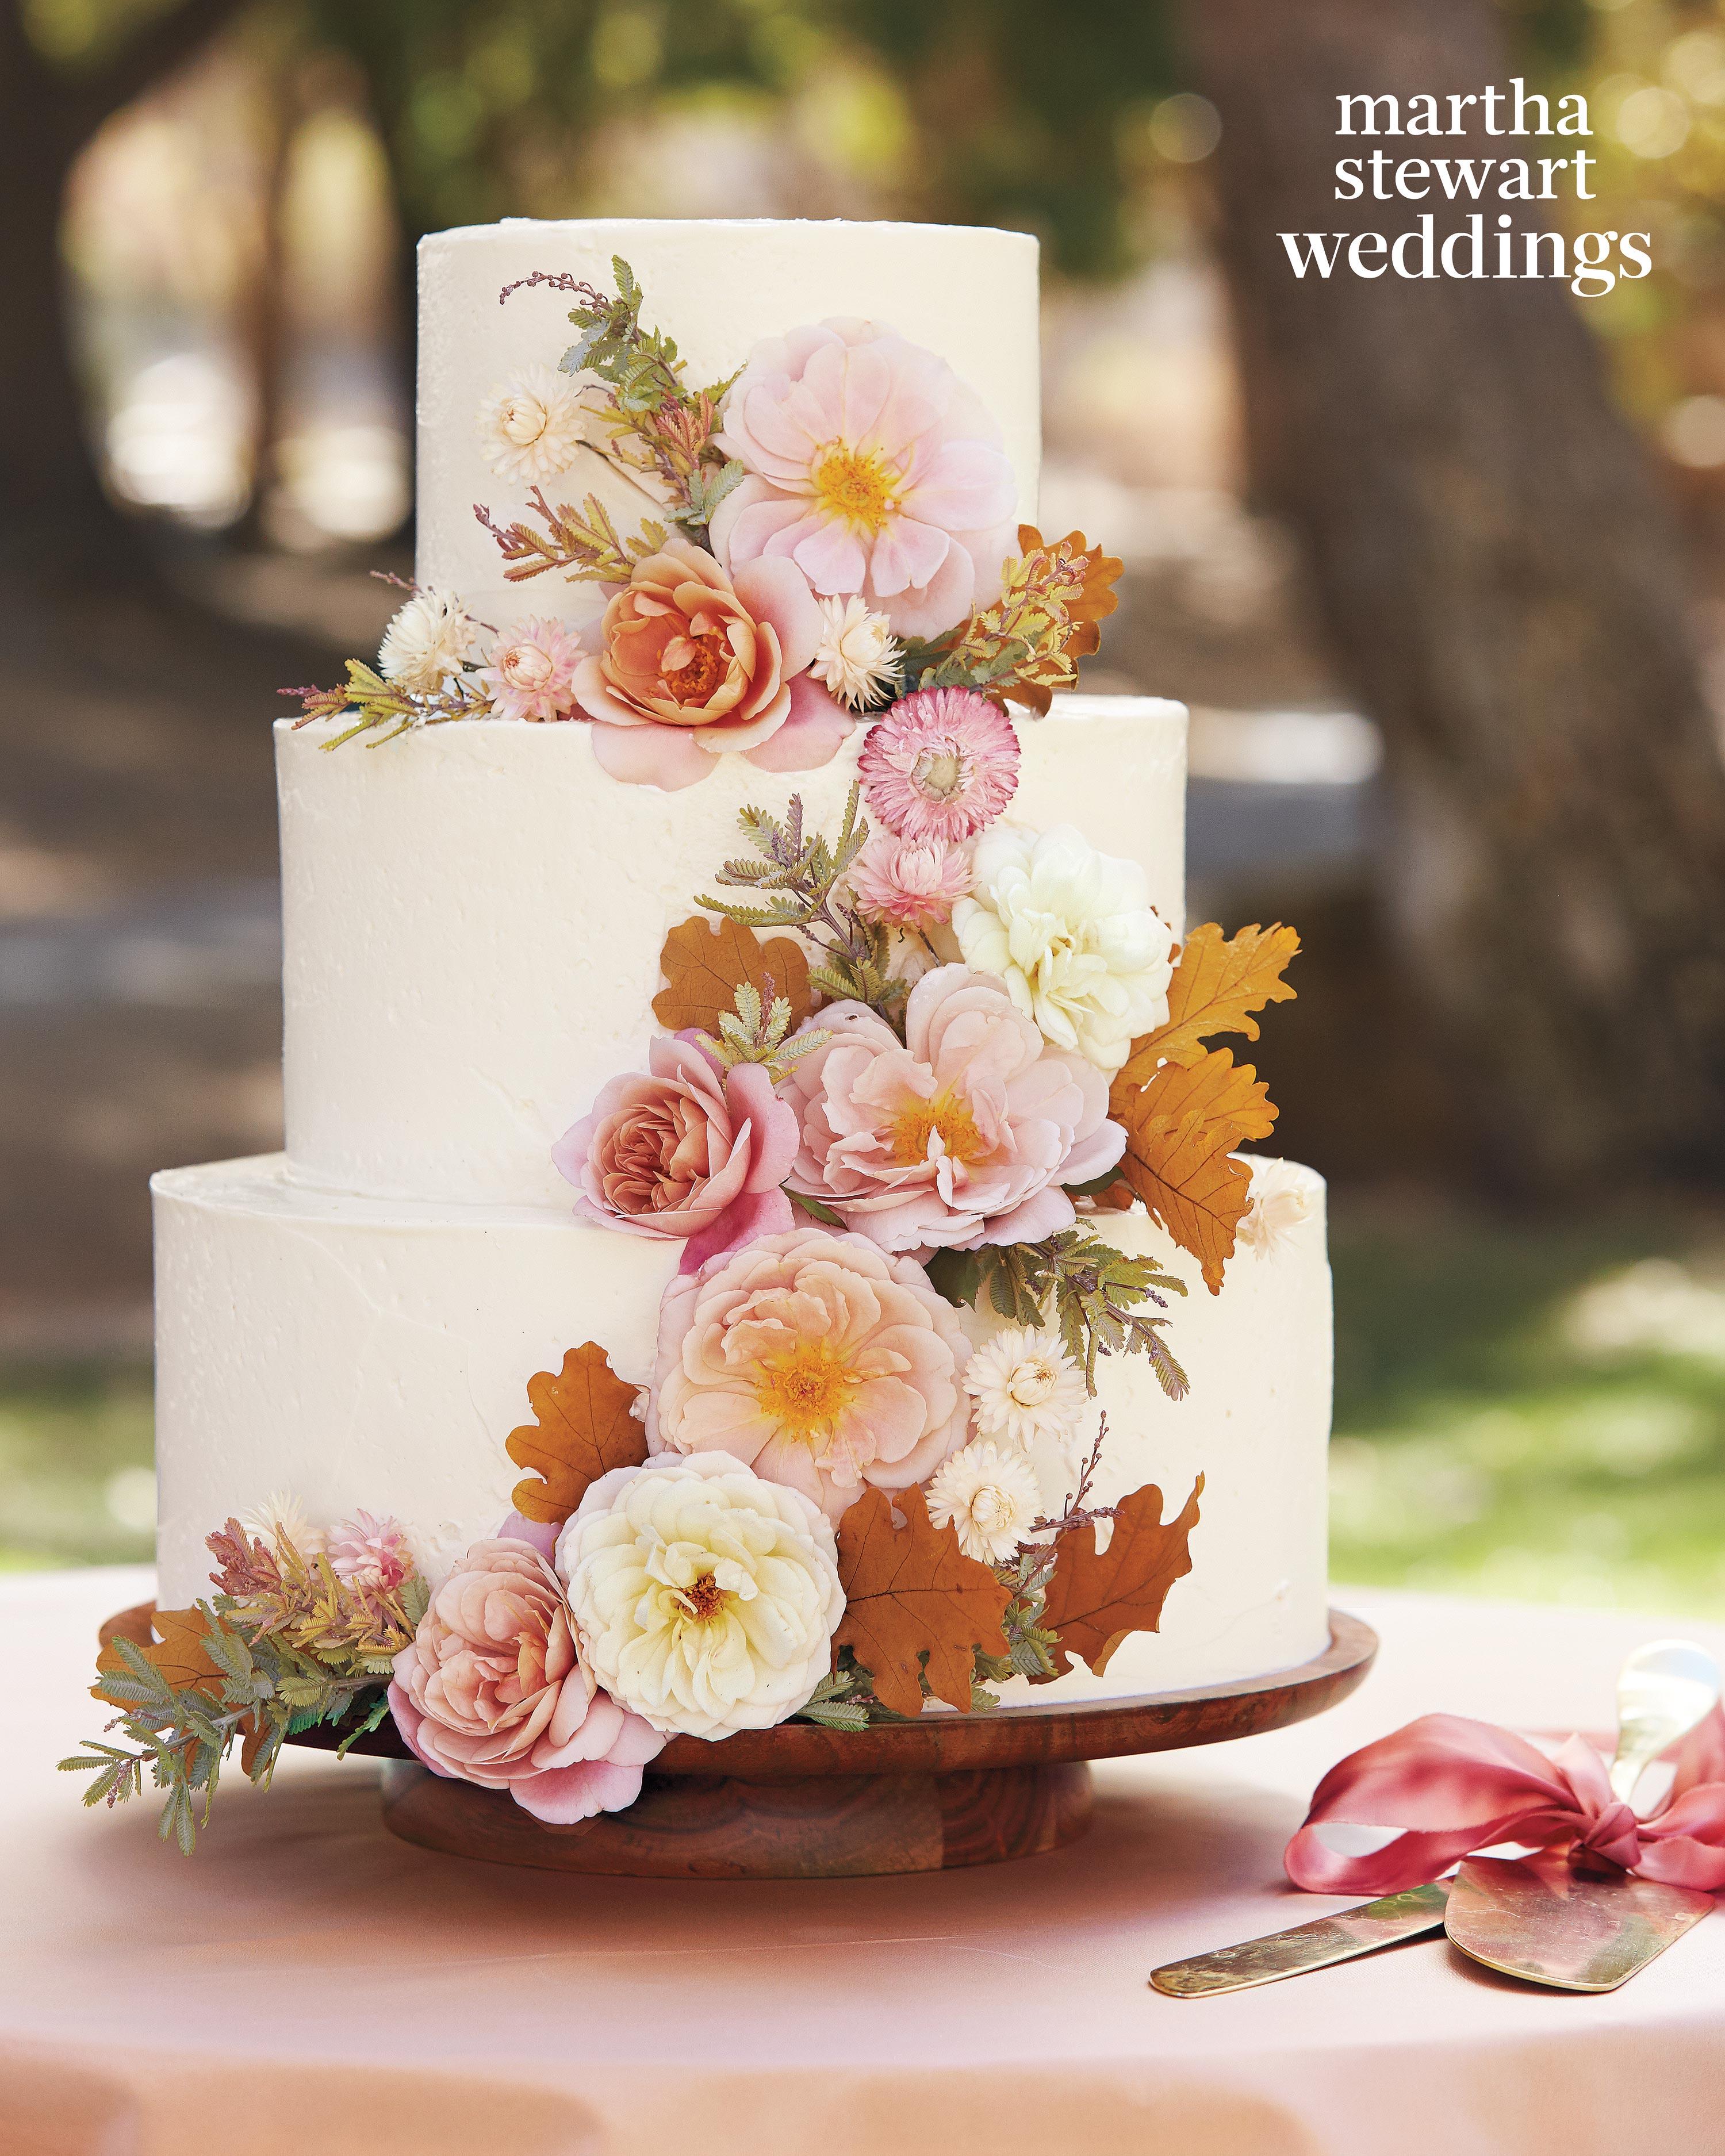 jamie-bryan-wedding-14-cake-0834-d112664.jpg